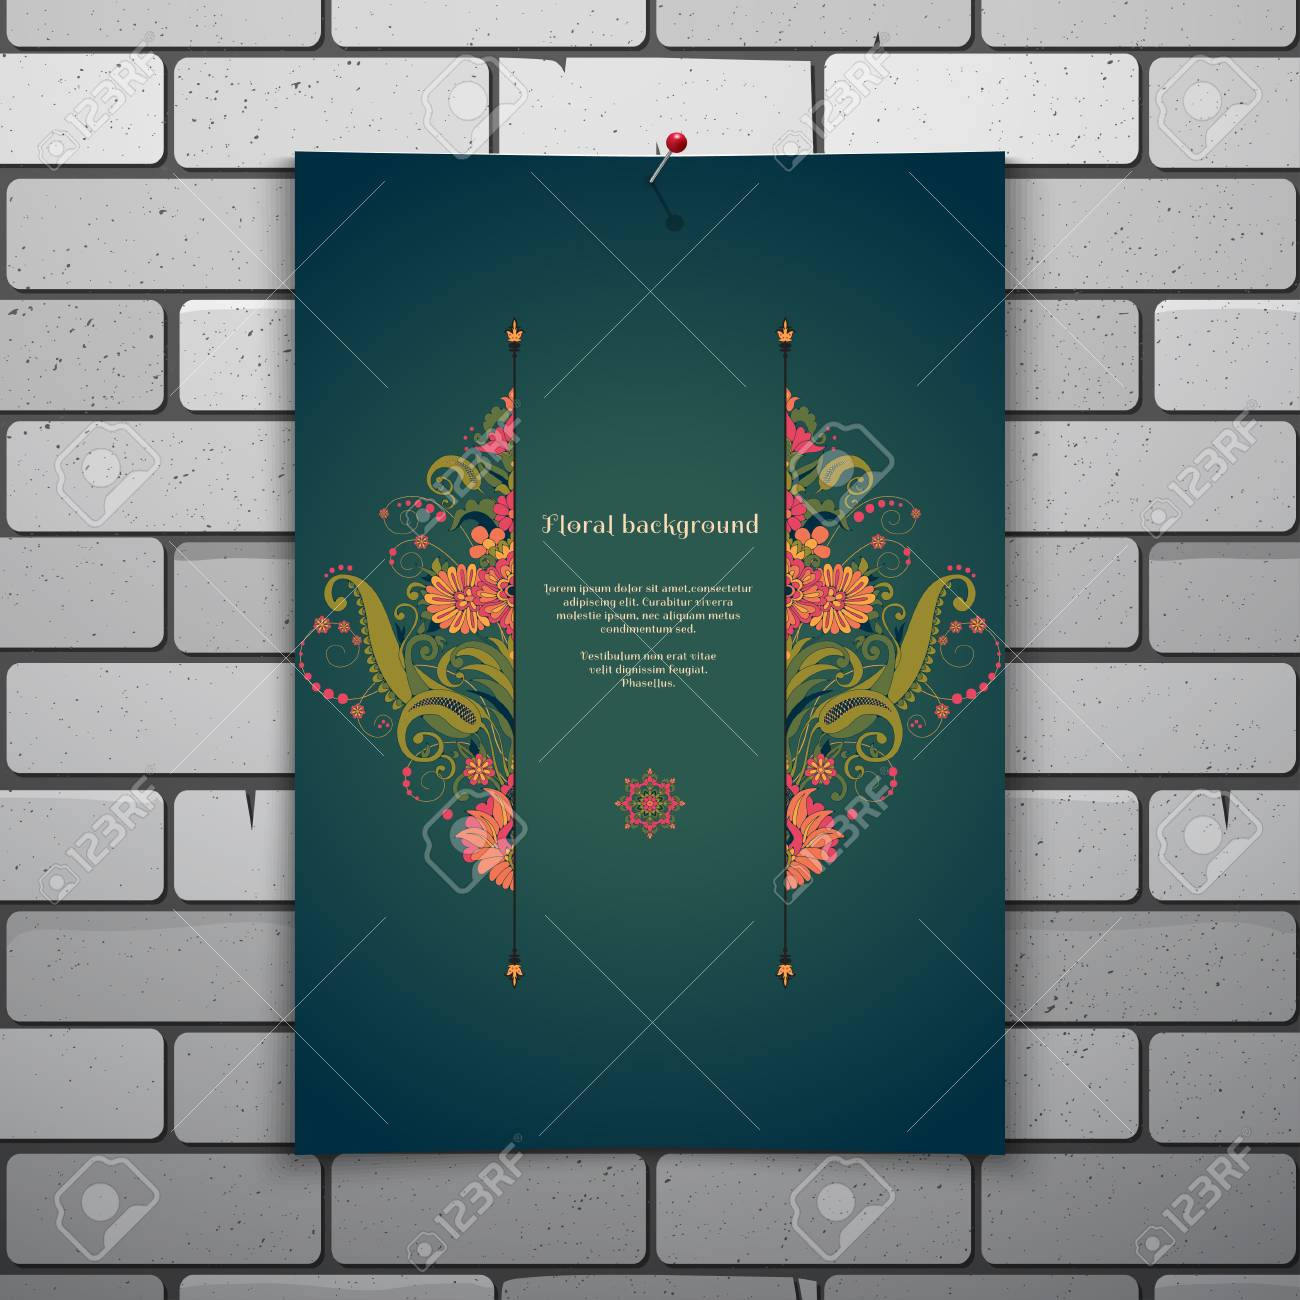 Brick wall digital background template stock illustration.